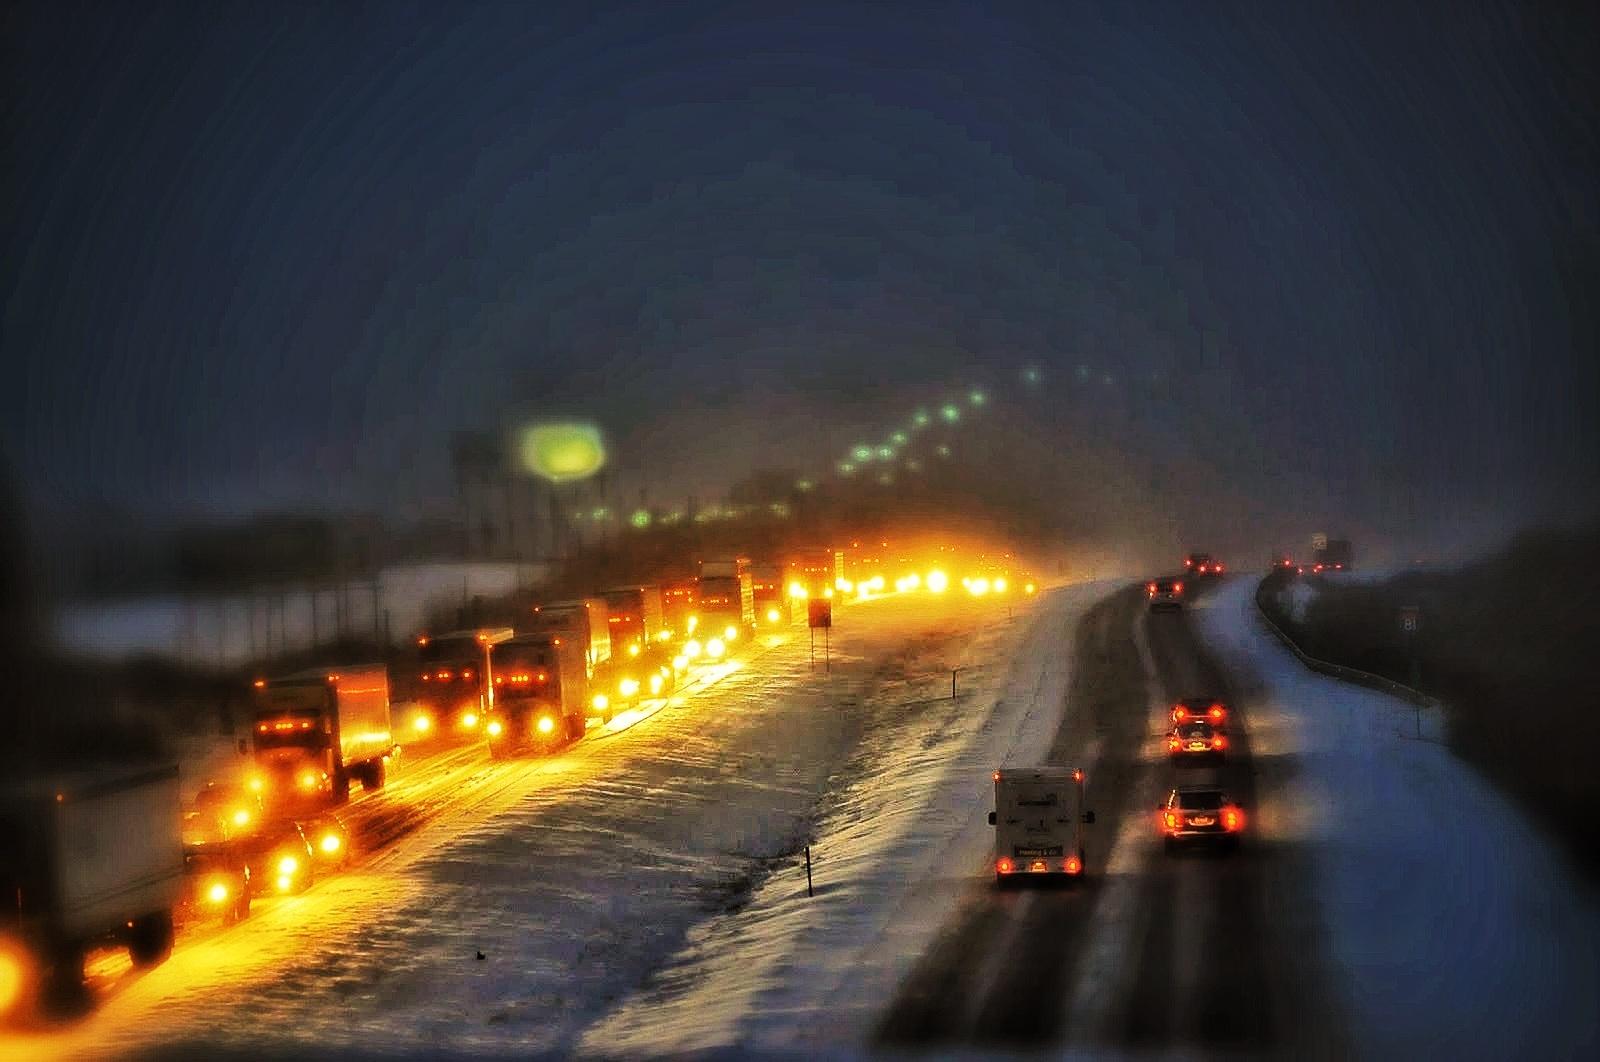 Snow Storm Traffic 2 by SeeThruMineEyes